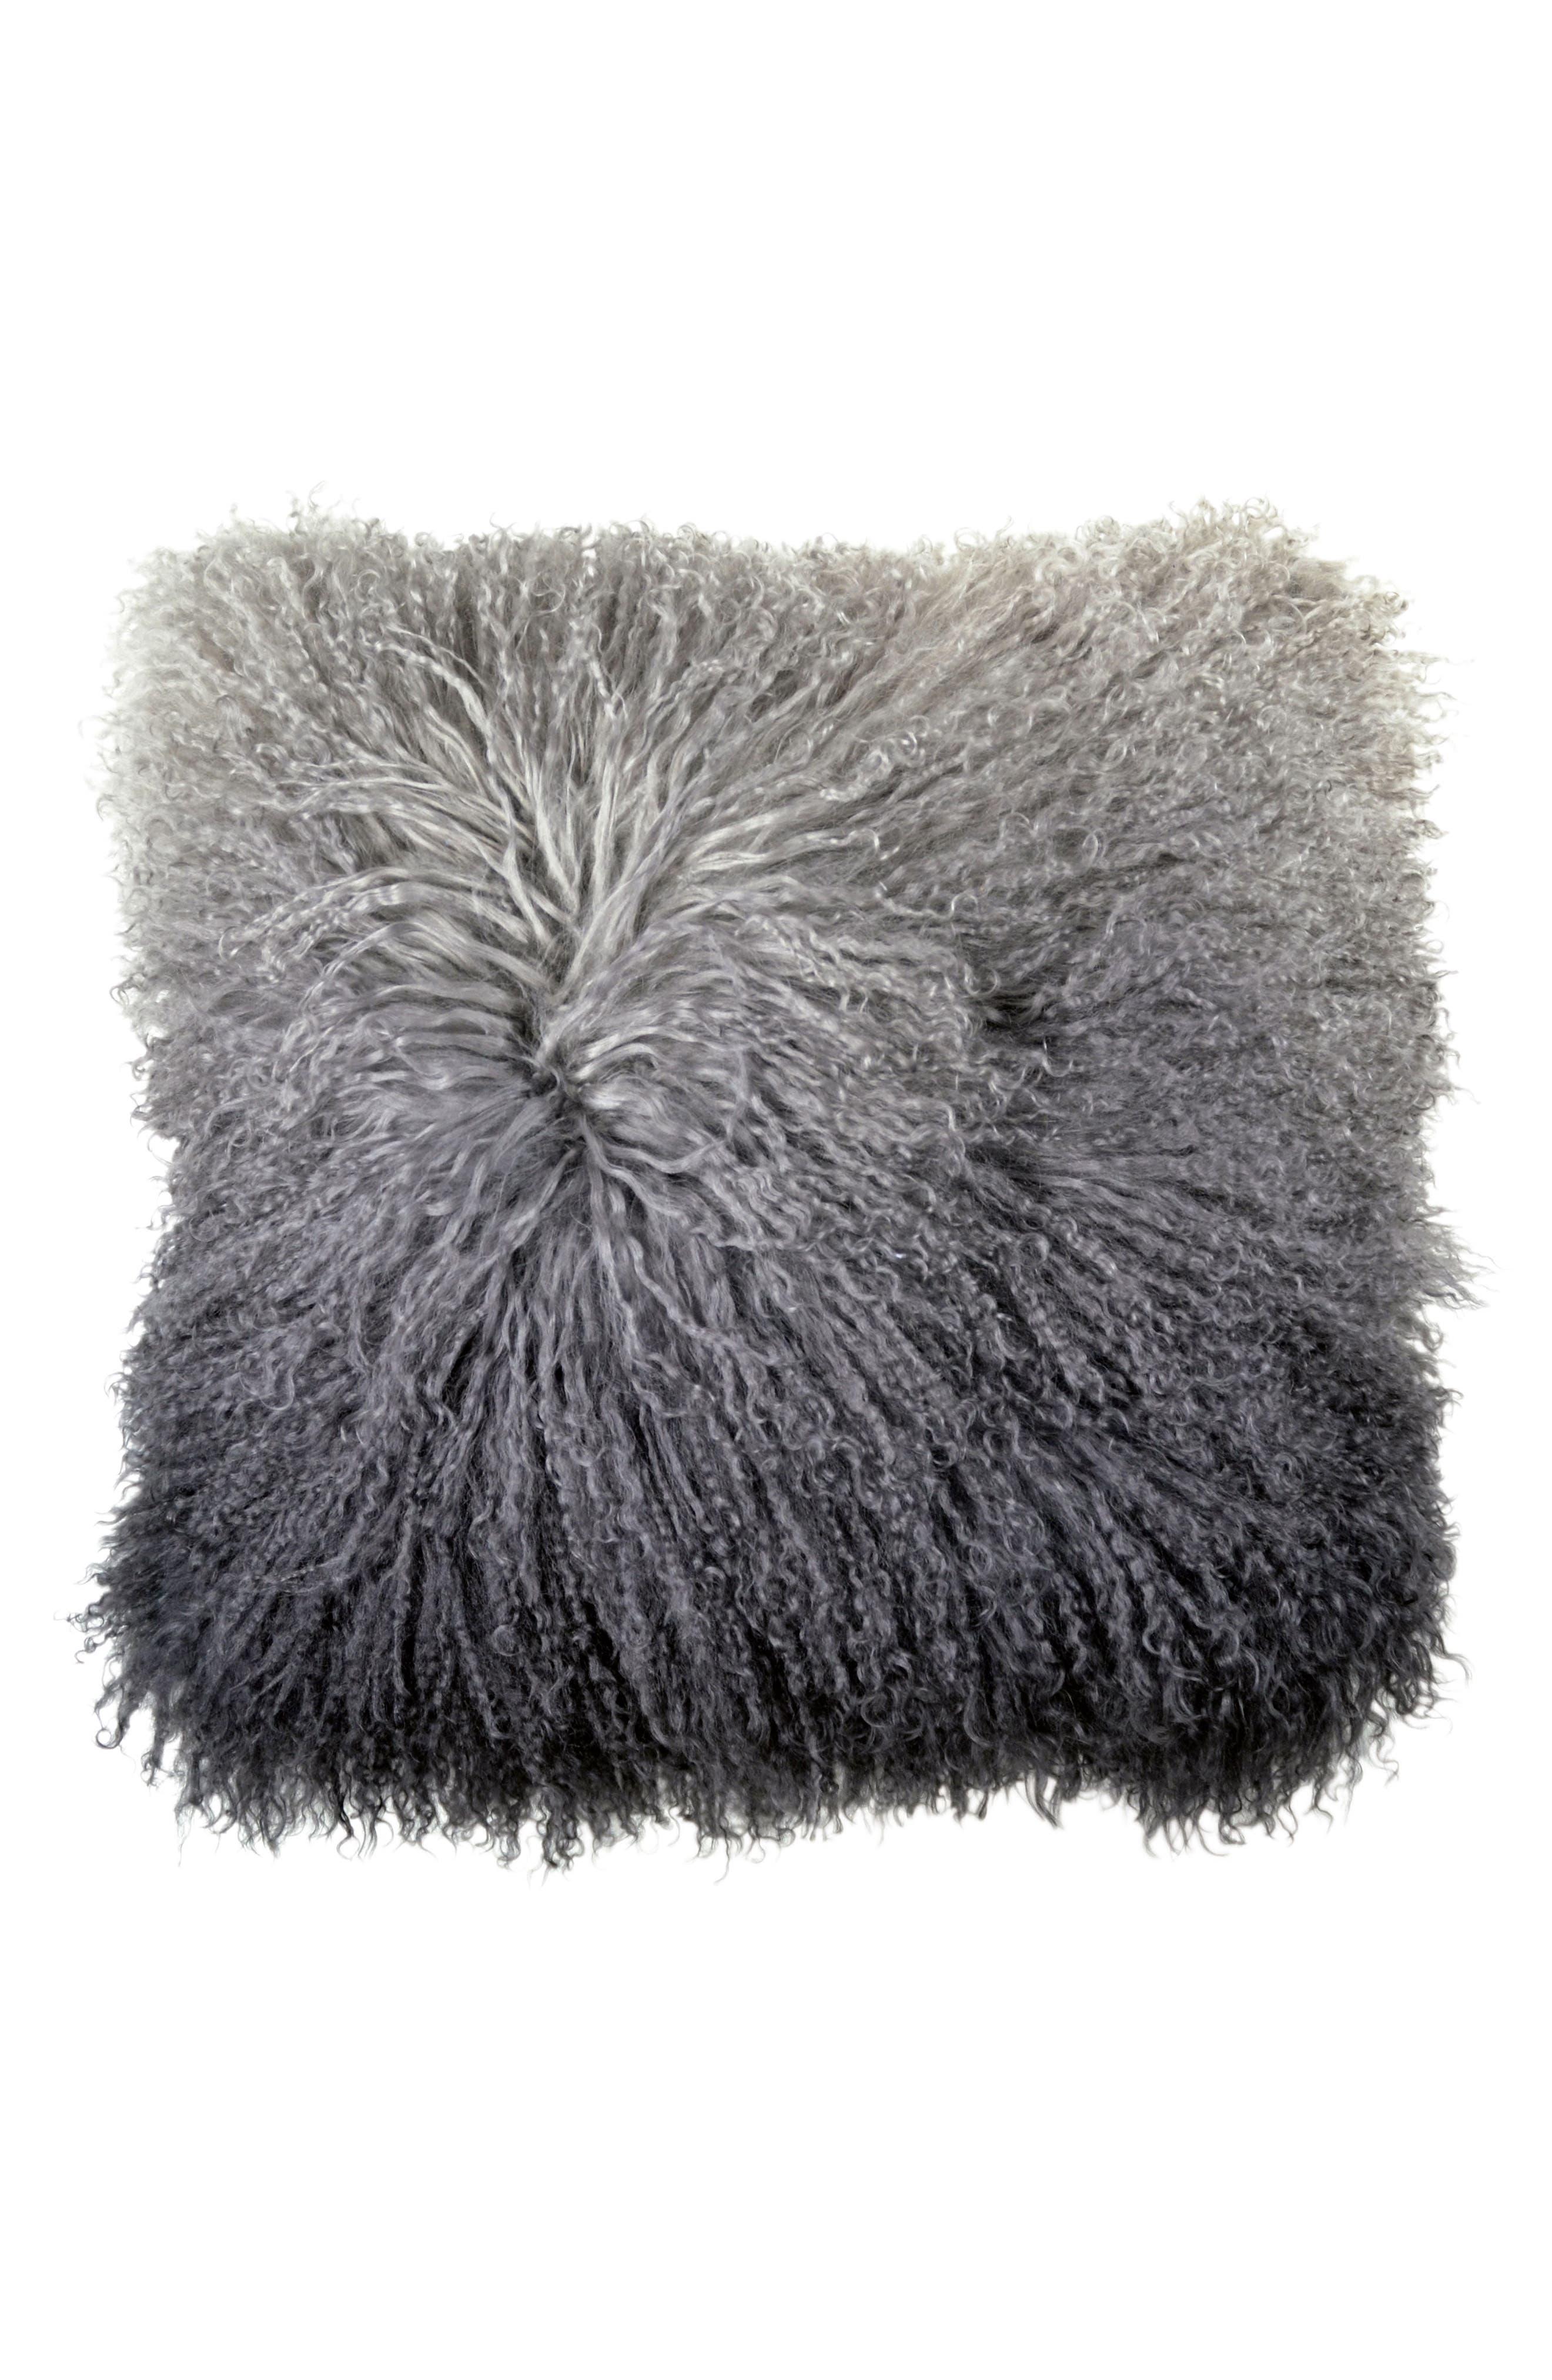 Alternate Image 1 Selected - Michael Aram Dip Dye Sheepskin Accent Pillow